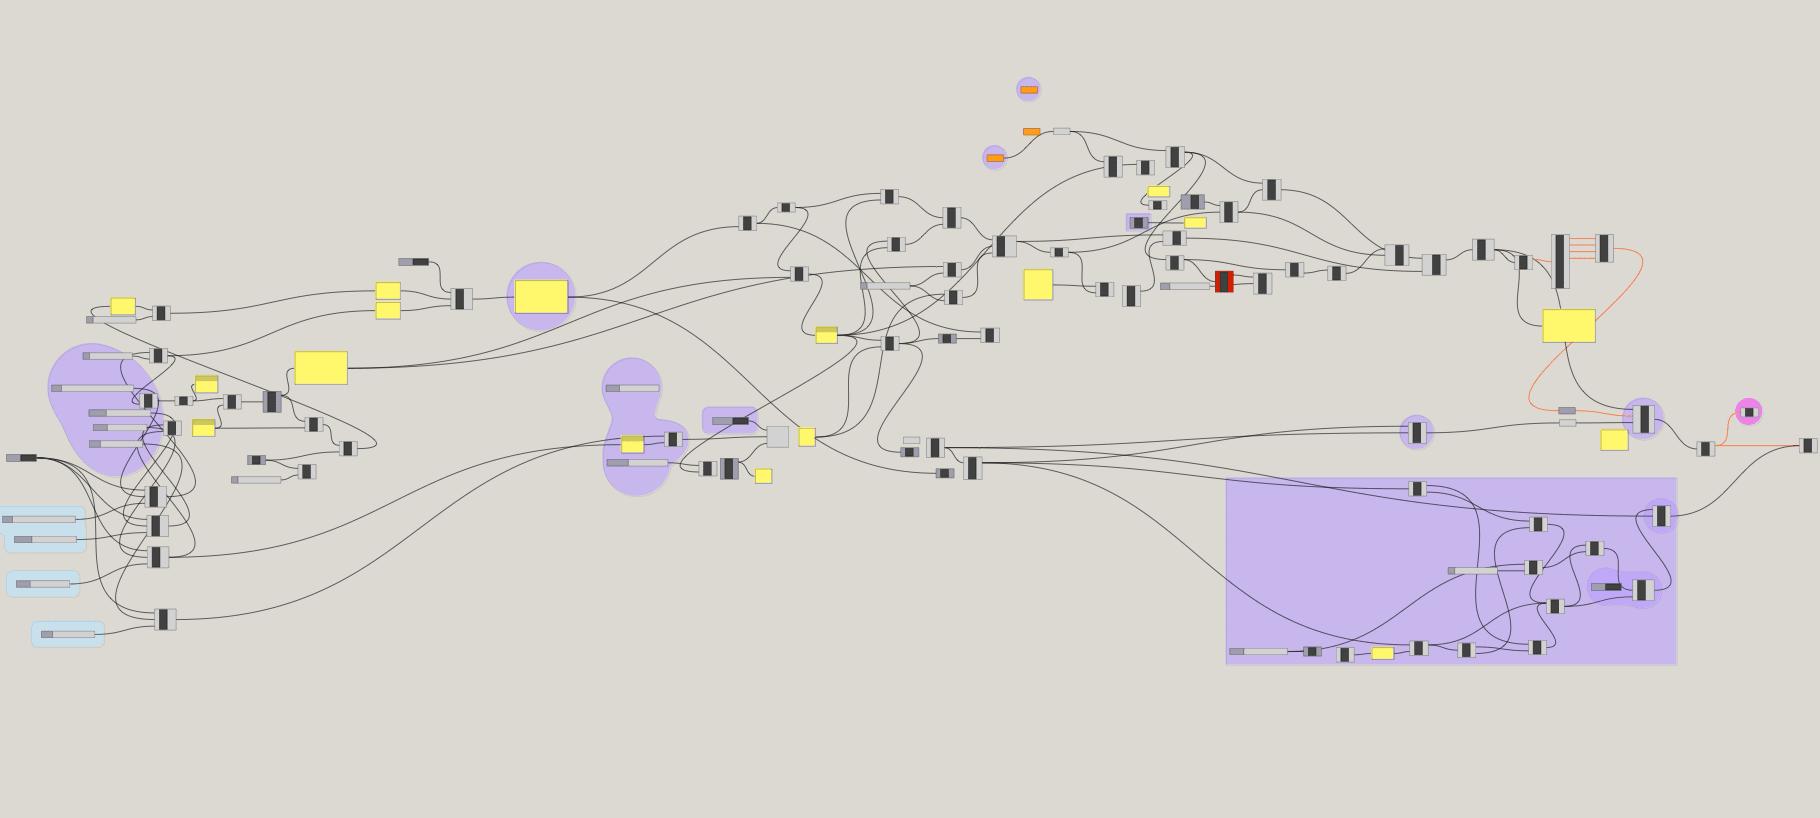 cunicode_permutation_process_15.png